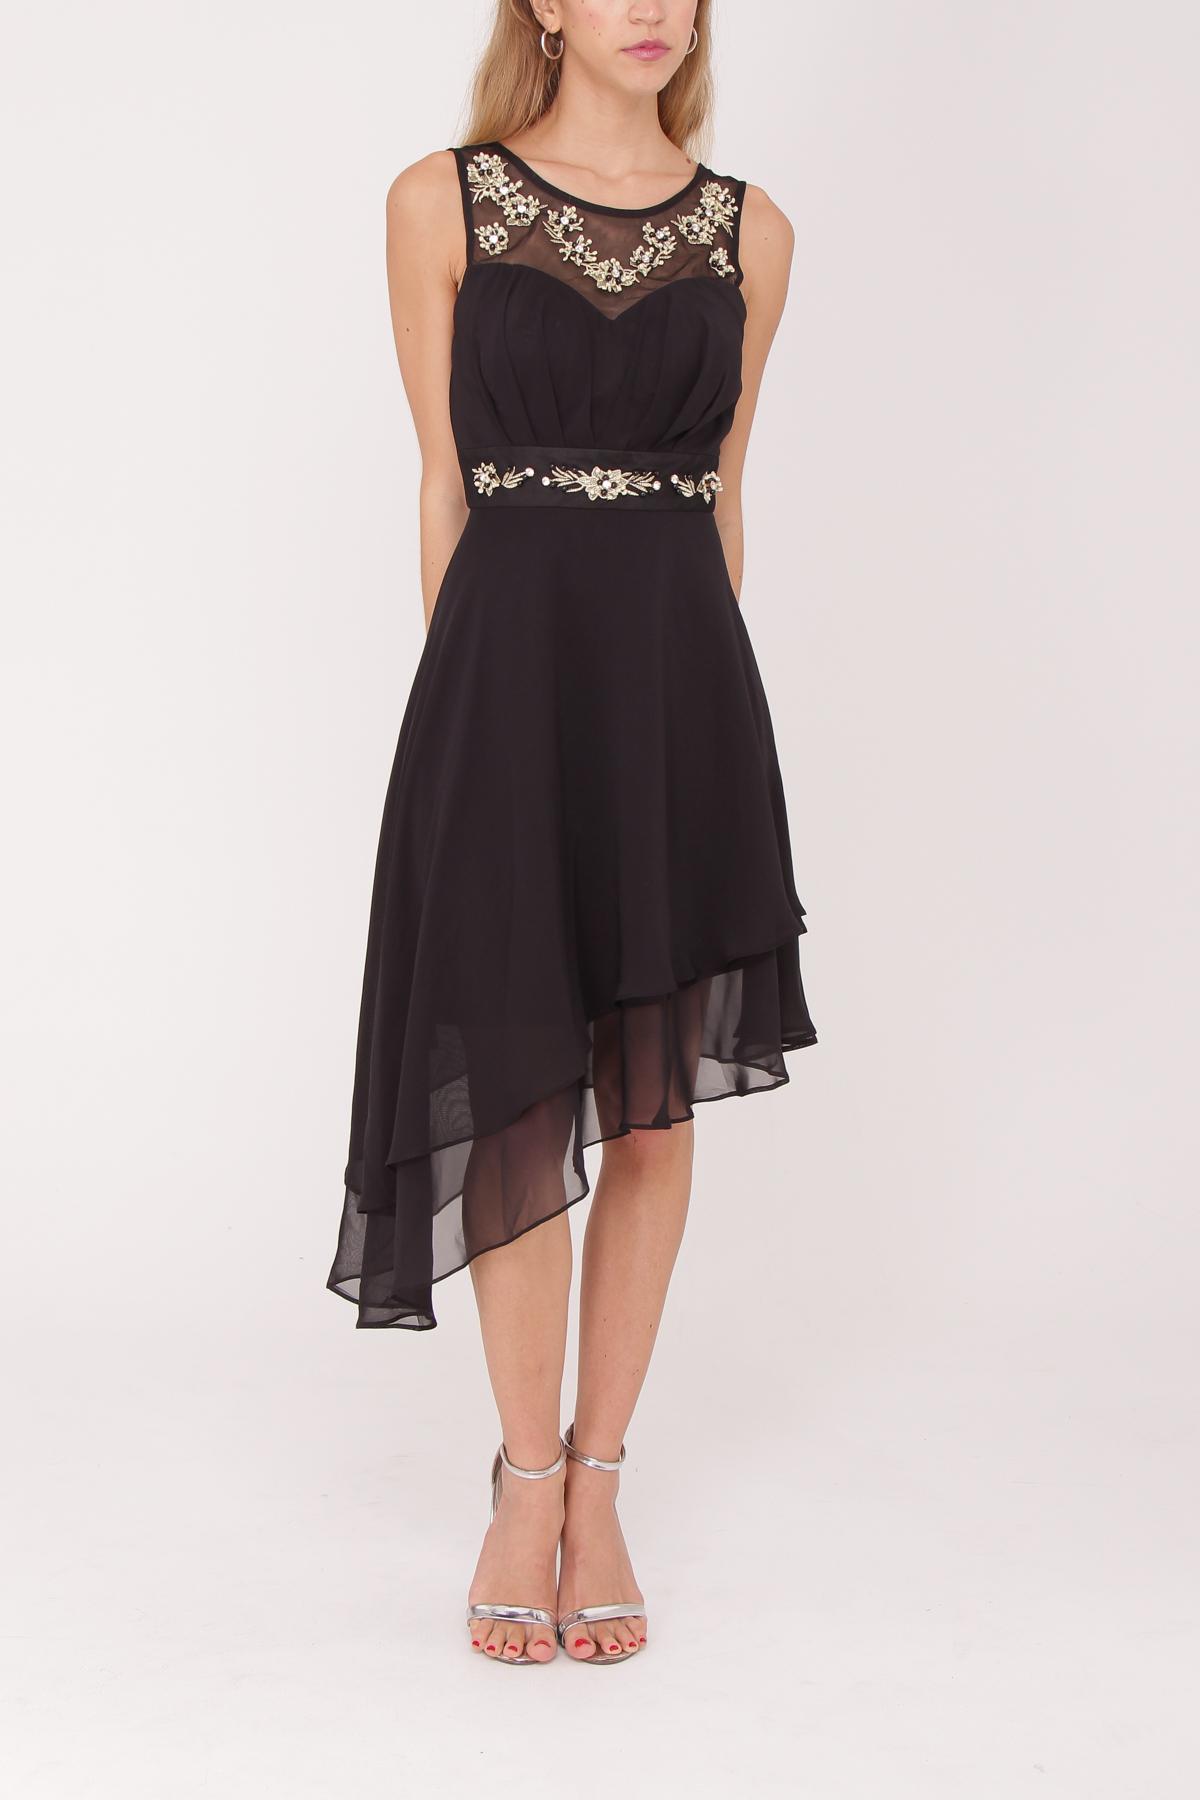 robe de cocktail mi longue ASHWI asm2915 noir S au 2XL